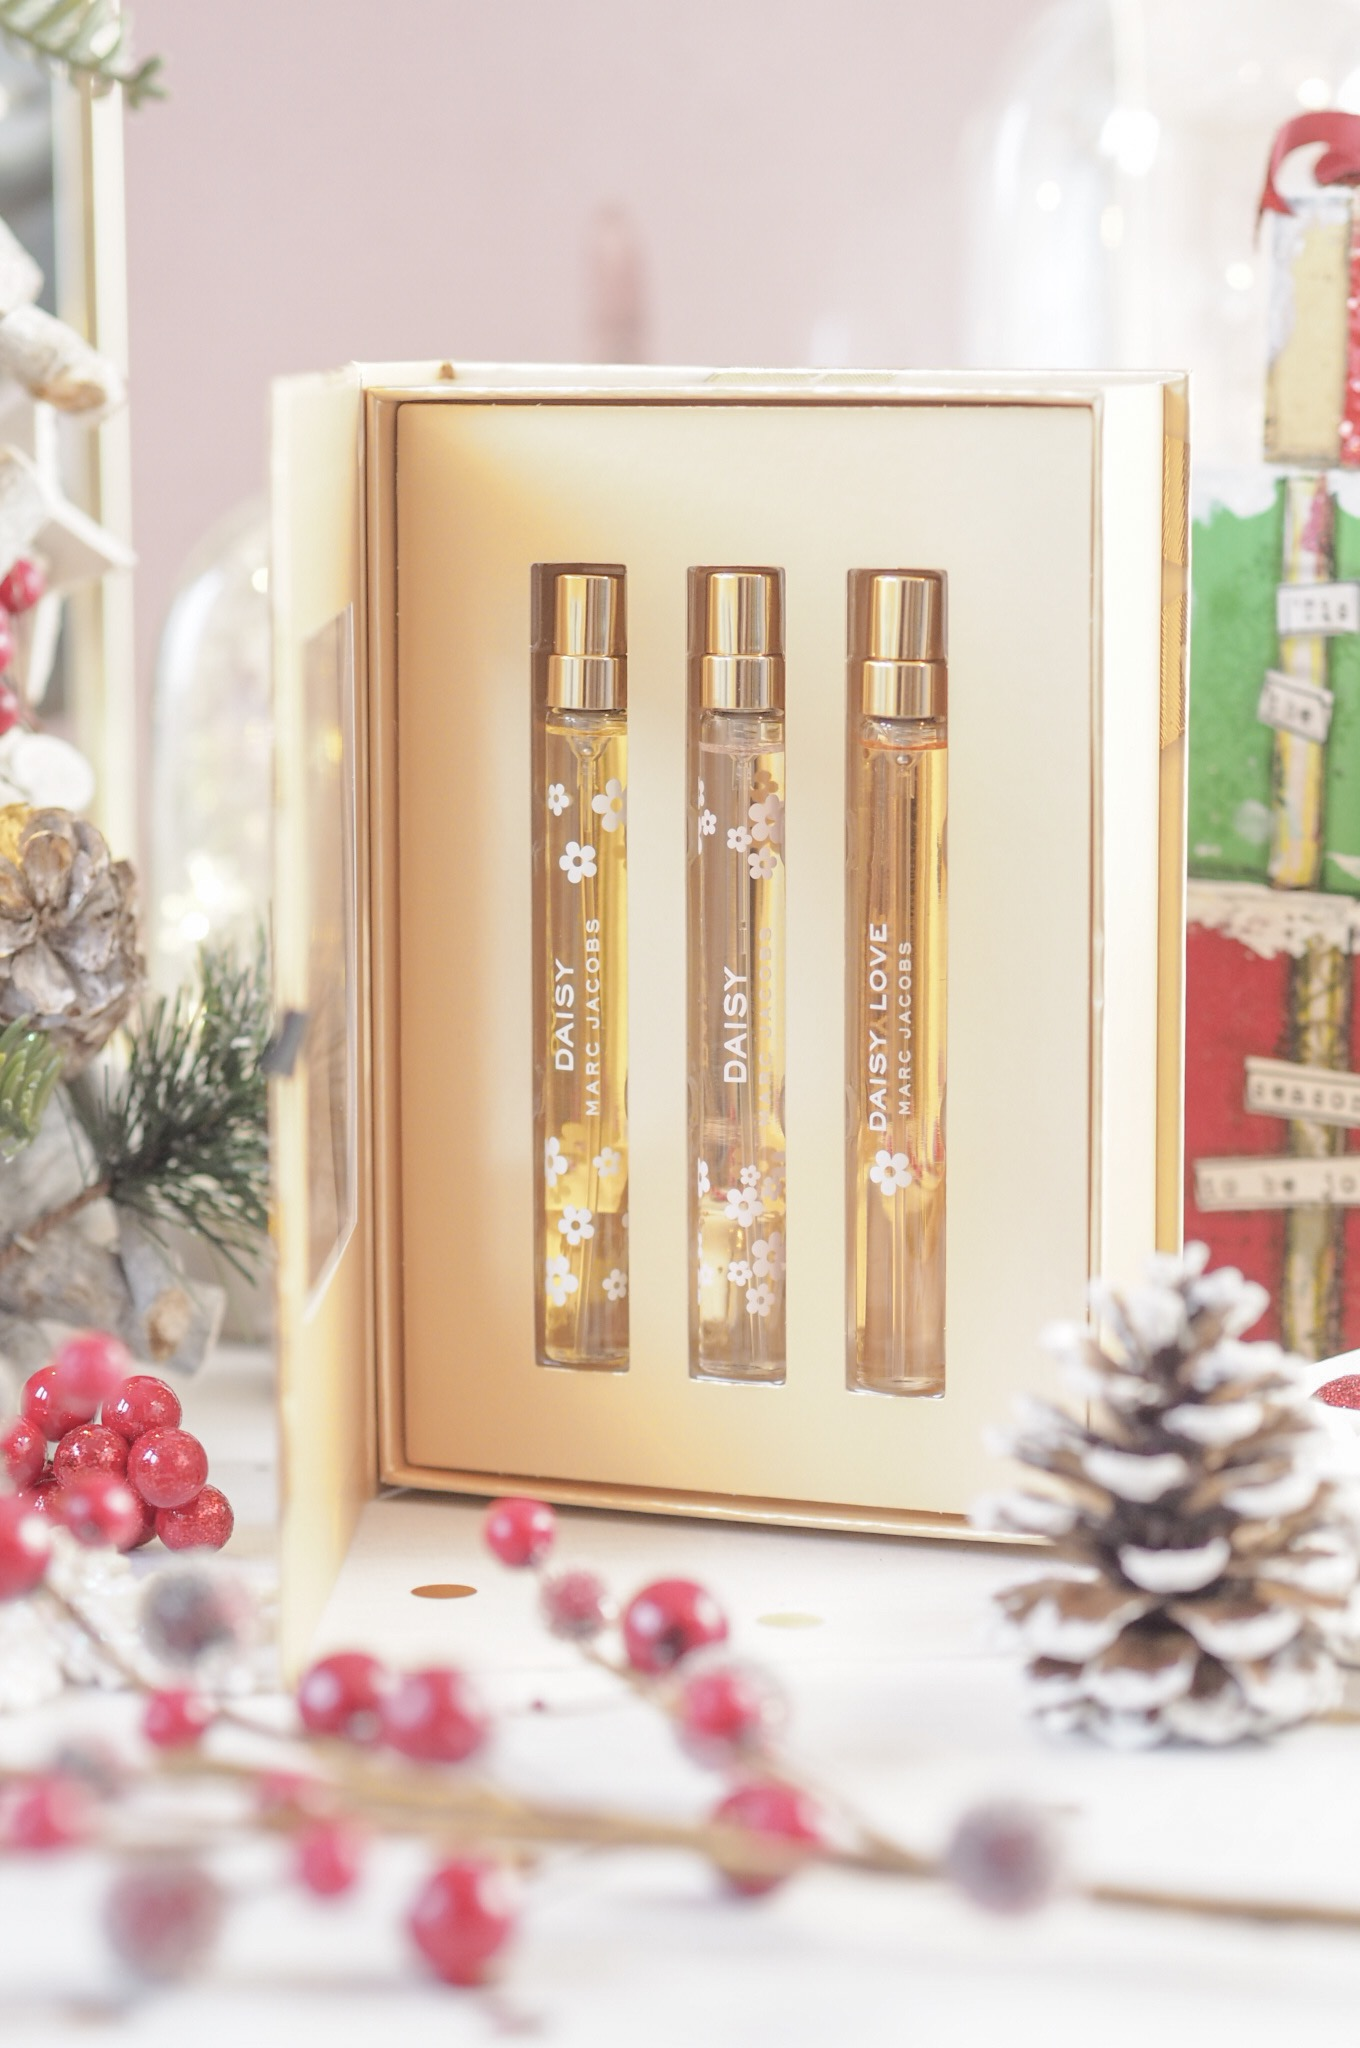 Marc Jacobs Daisy Gift Set - Christmas